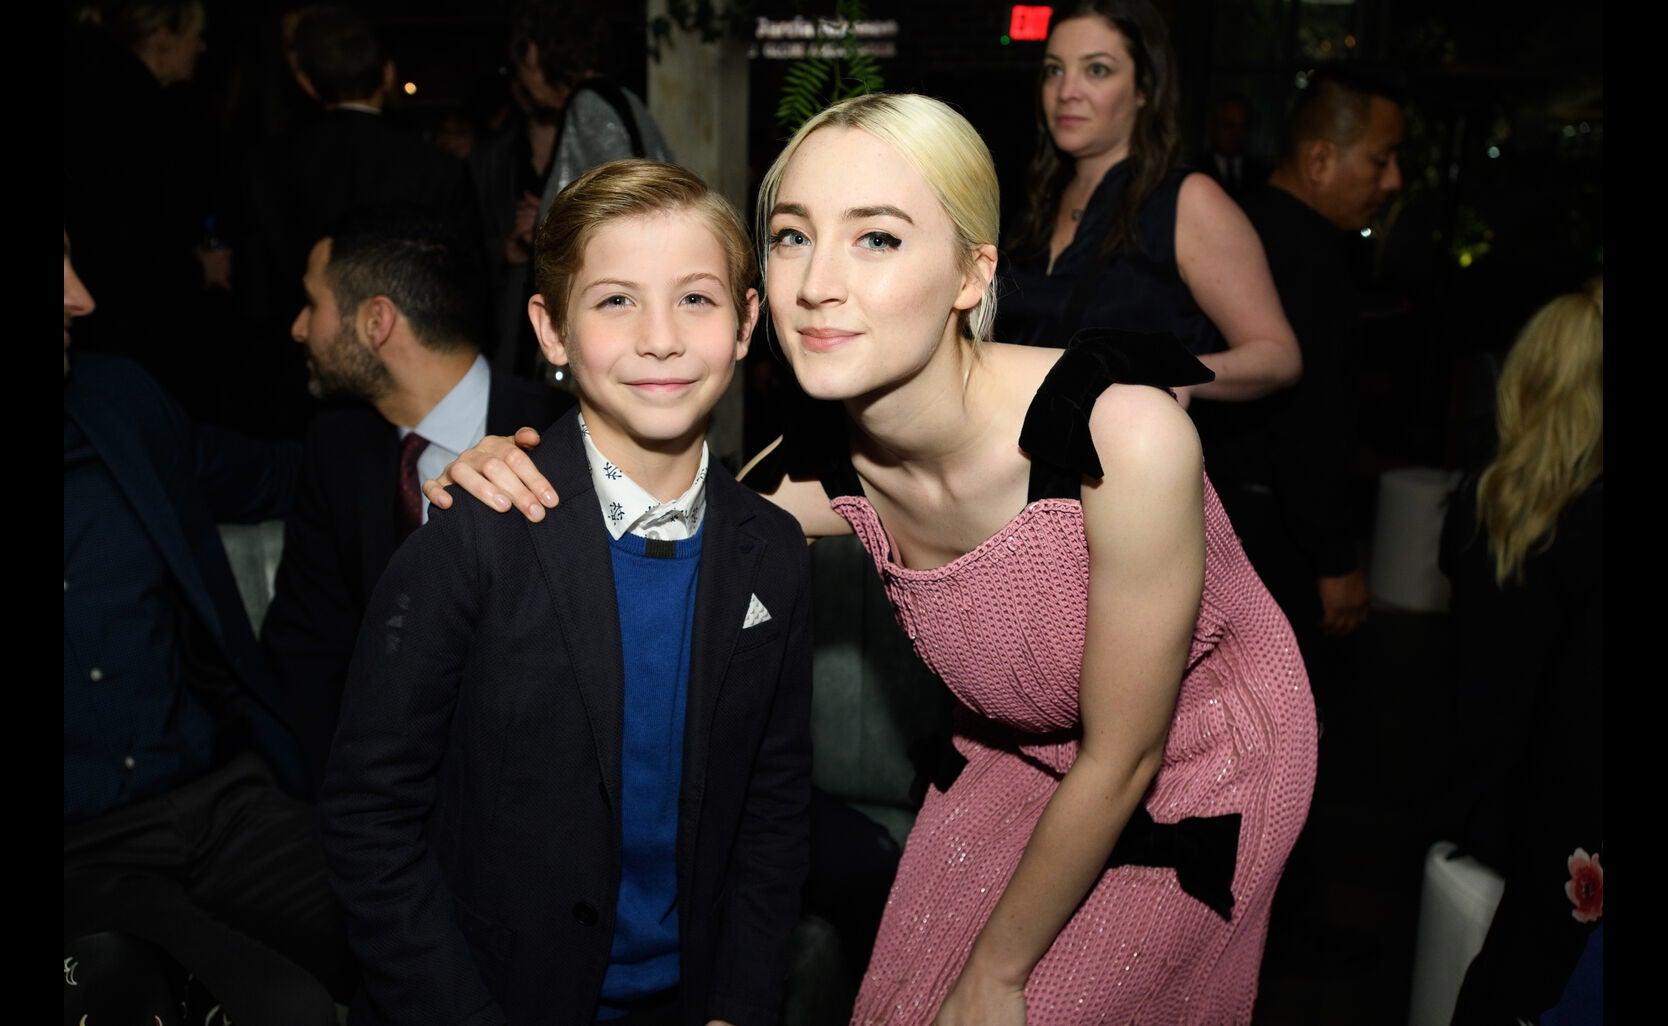 Jacob Tremblay and Saoirse Ronan at at the Golden Globe Ambassador 2018 event